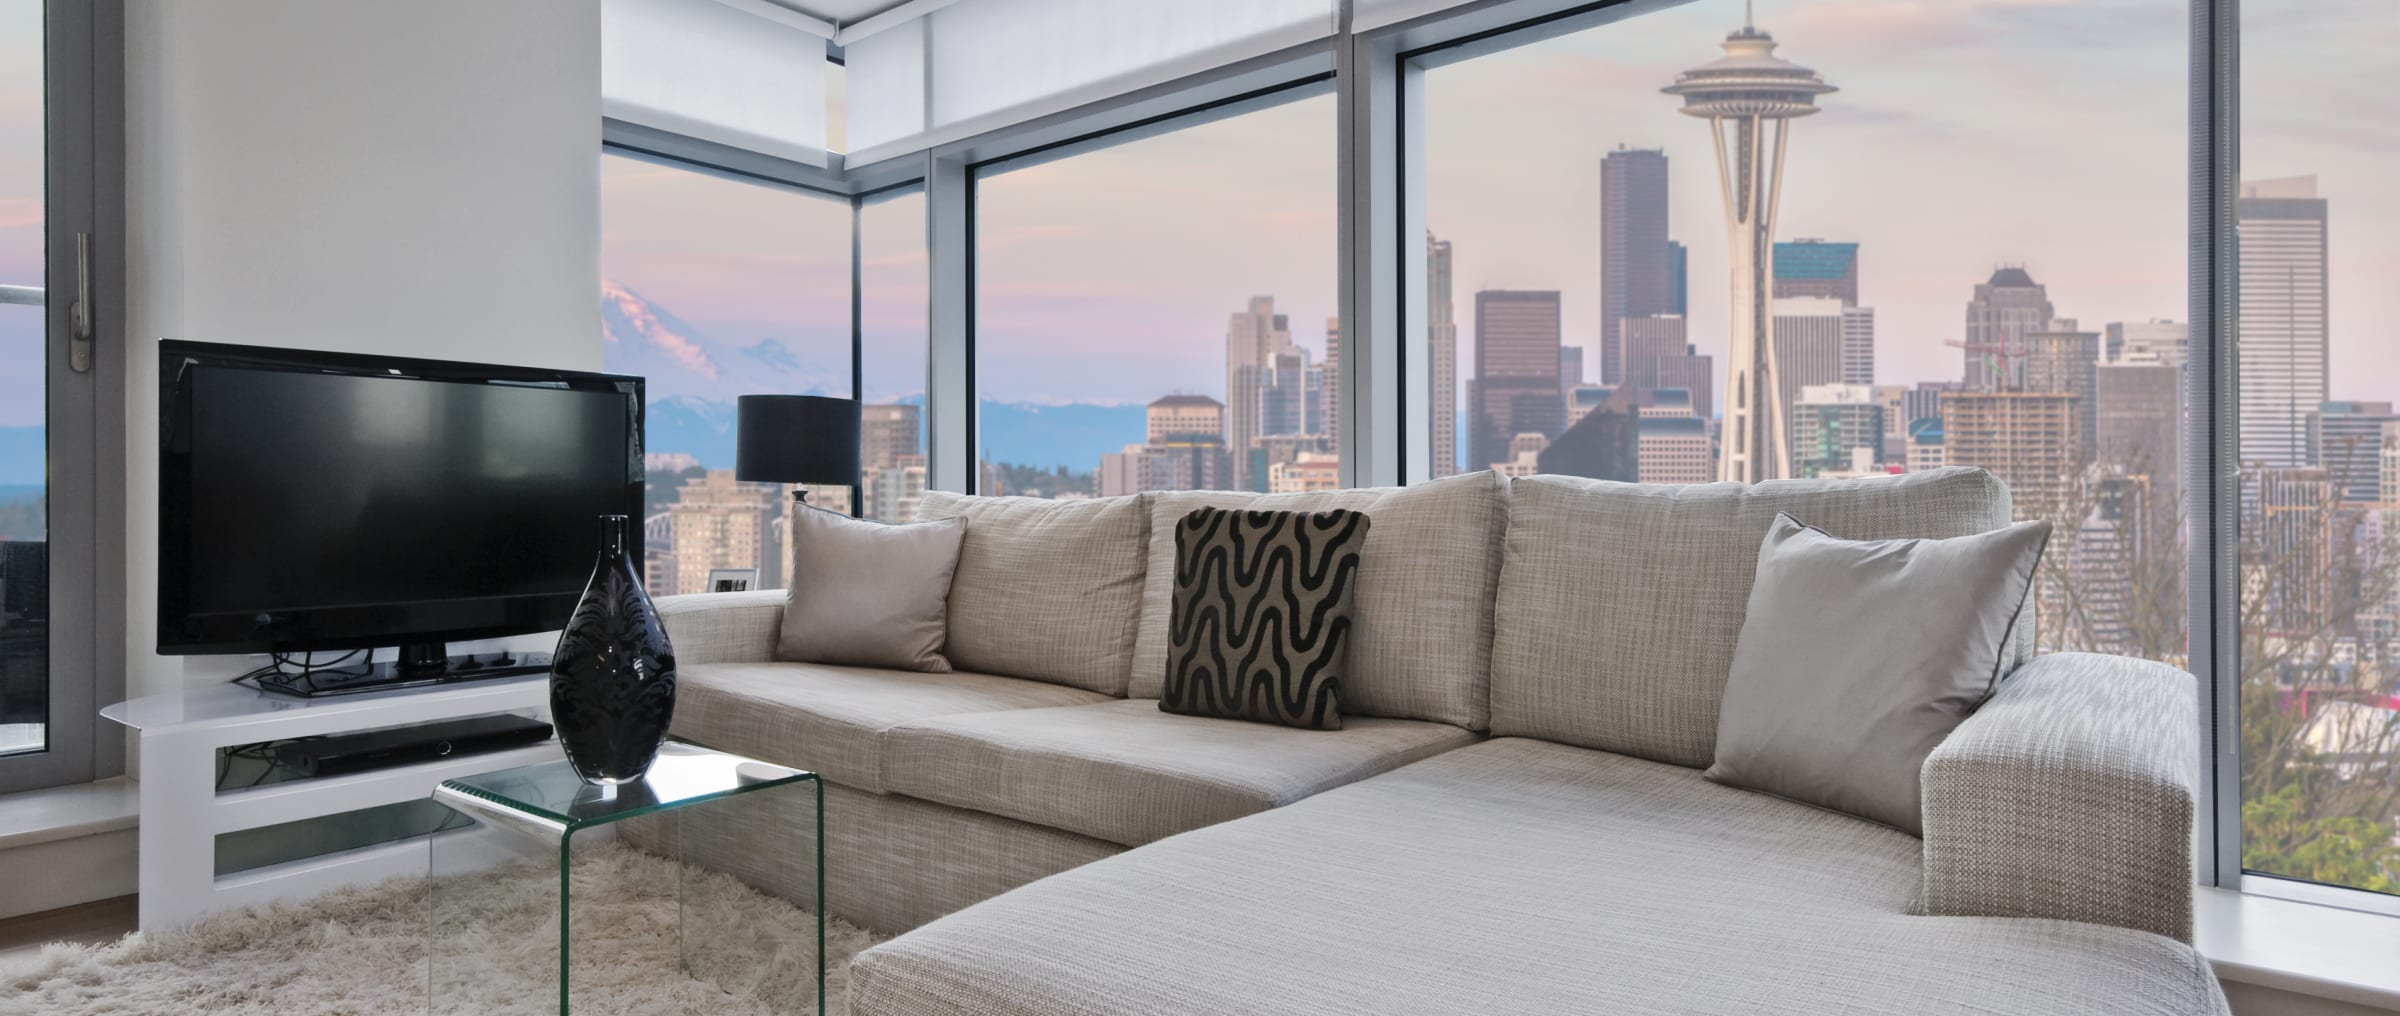 Cheap Apartments Los Angeles Rent Studio